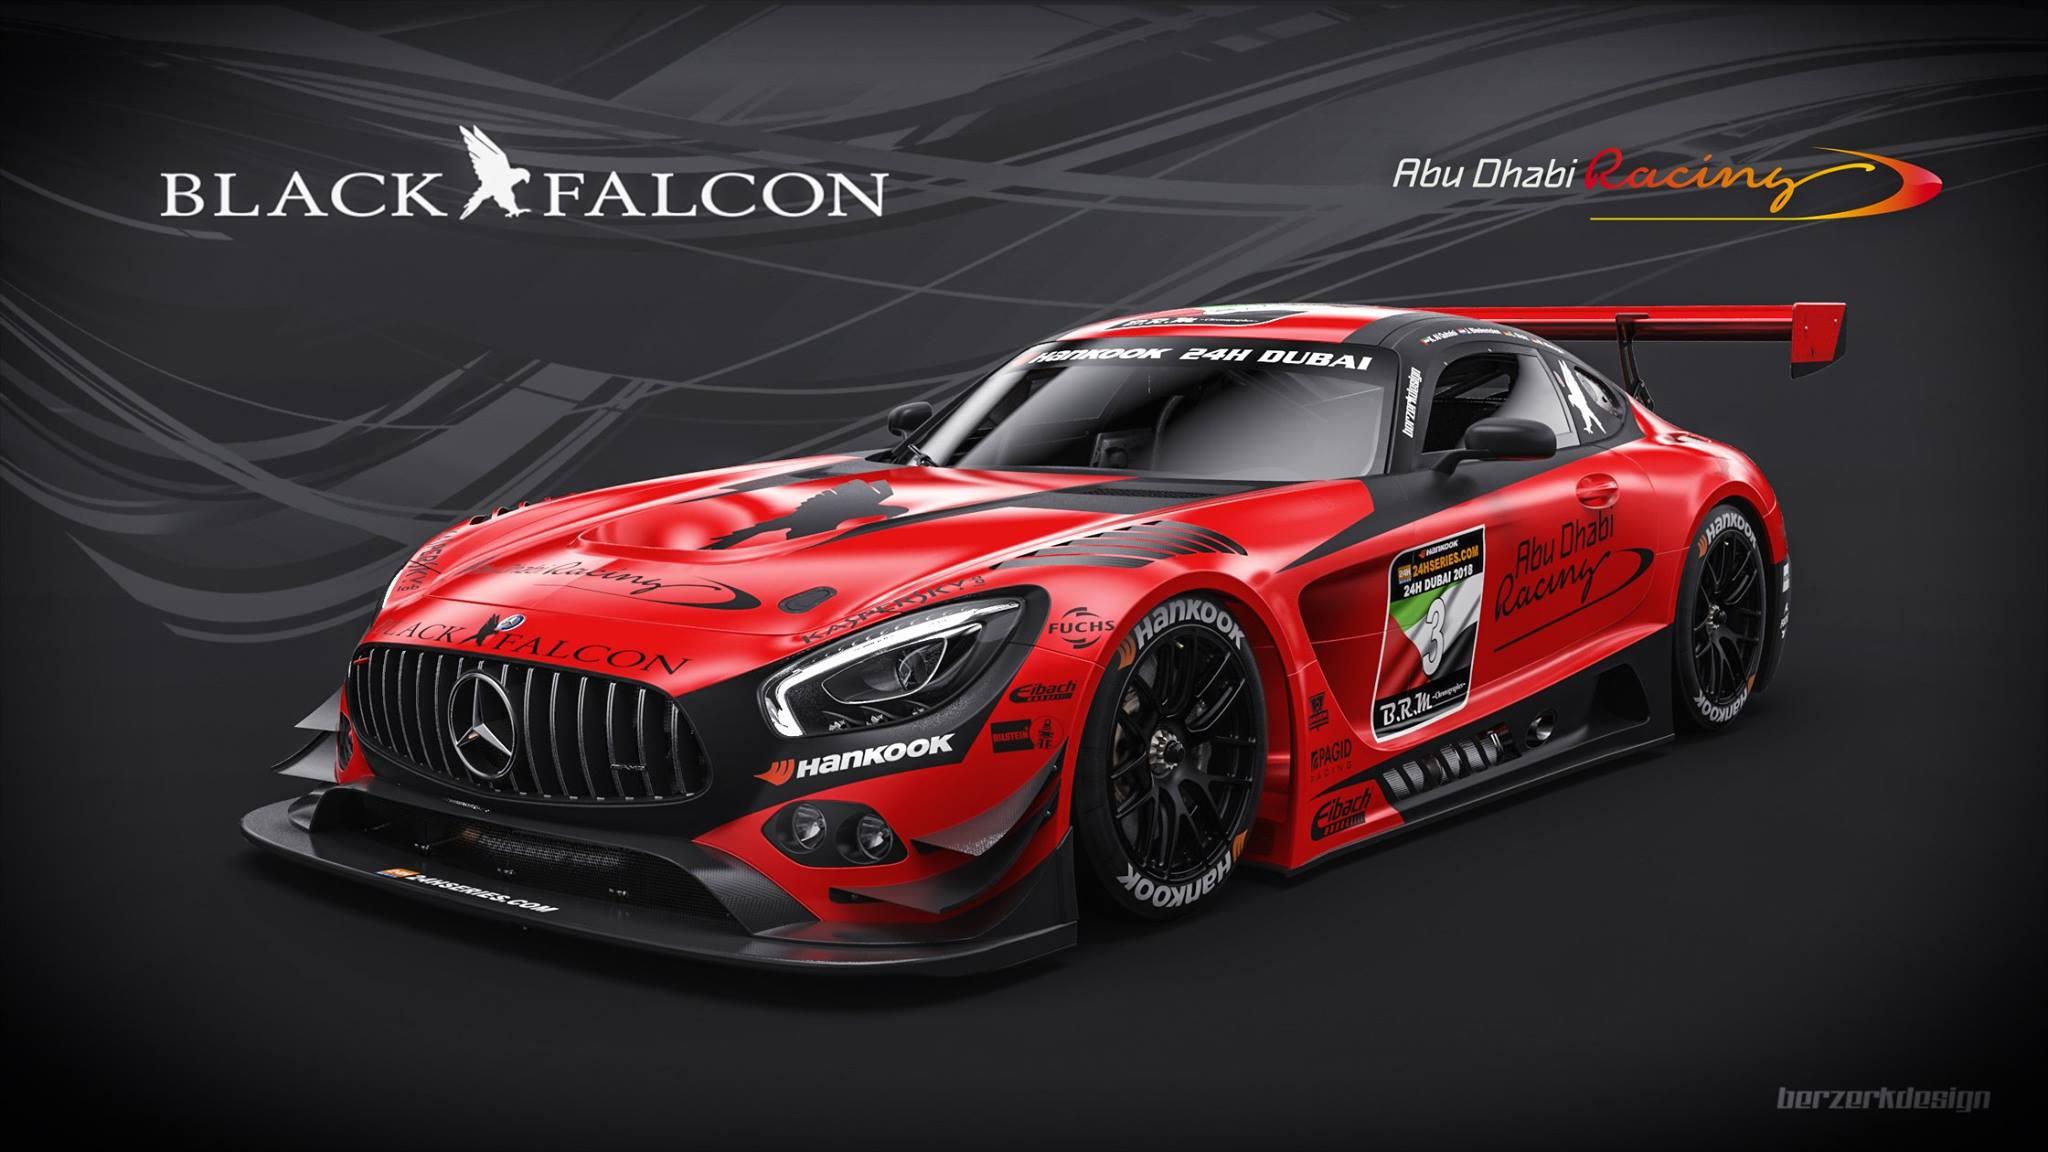 Fotostrecke Black Falcon Zeigt Erste Fahrzeuggestaltung F 252 R Dubai Sportscar Info De